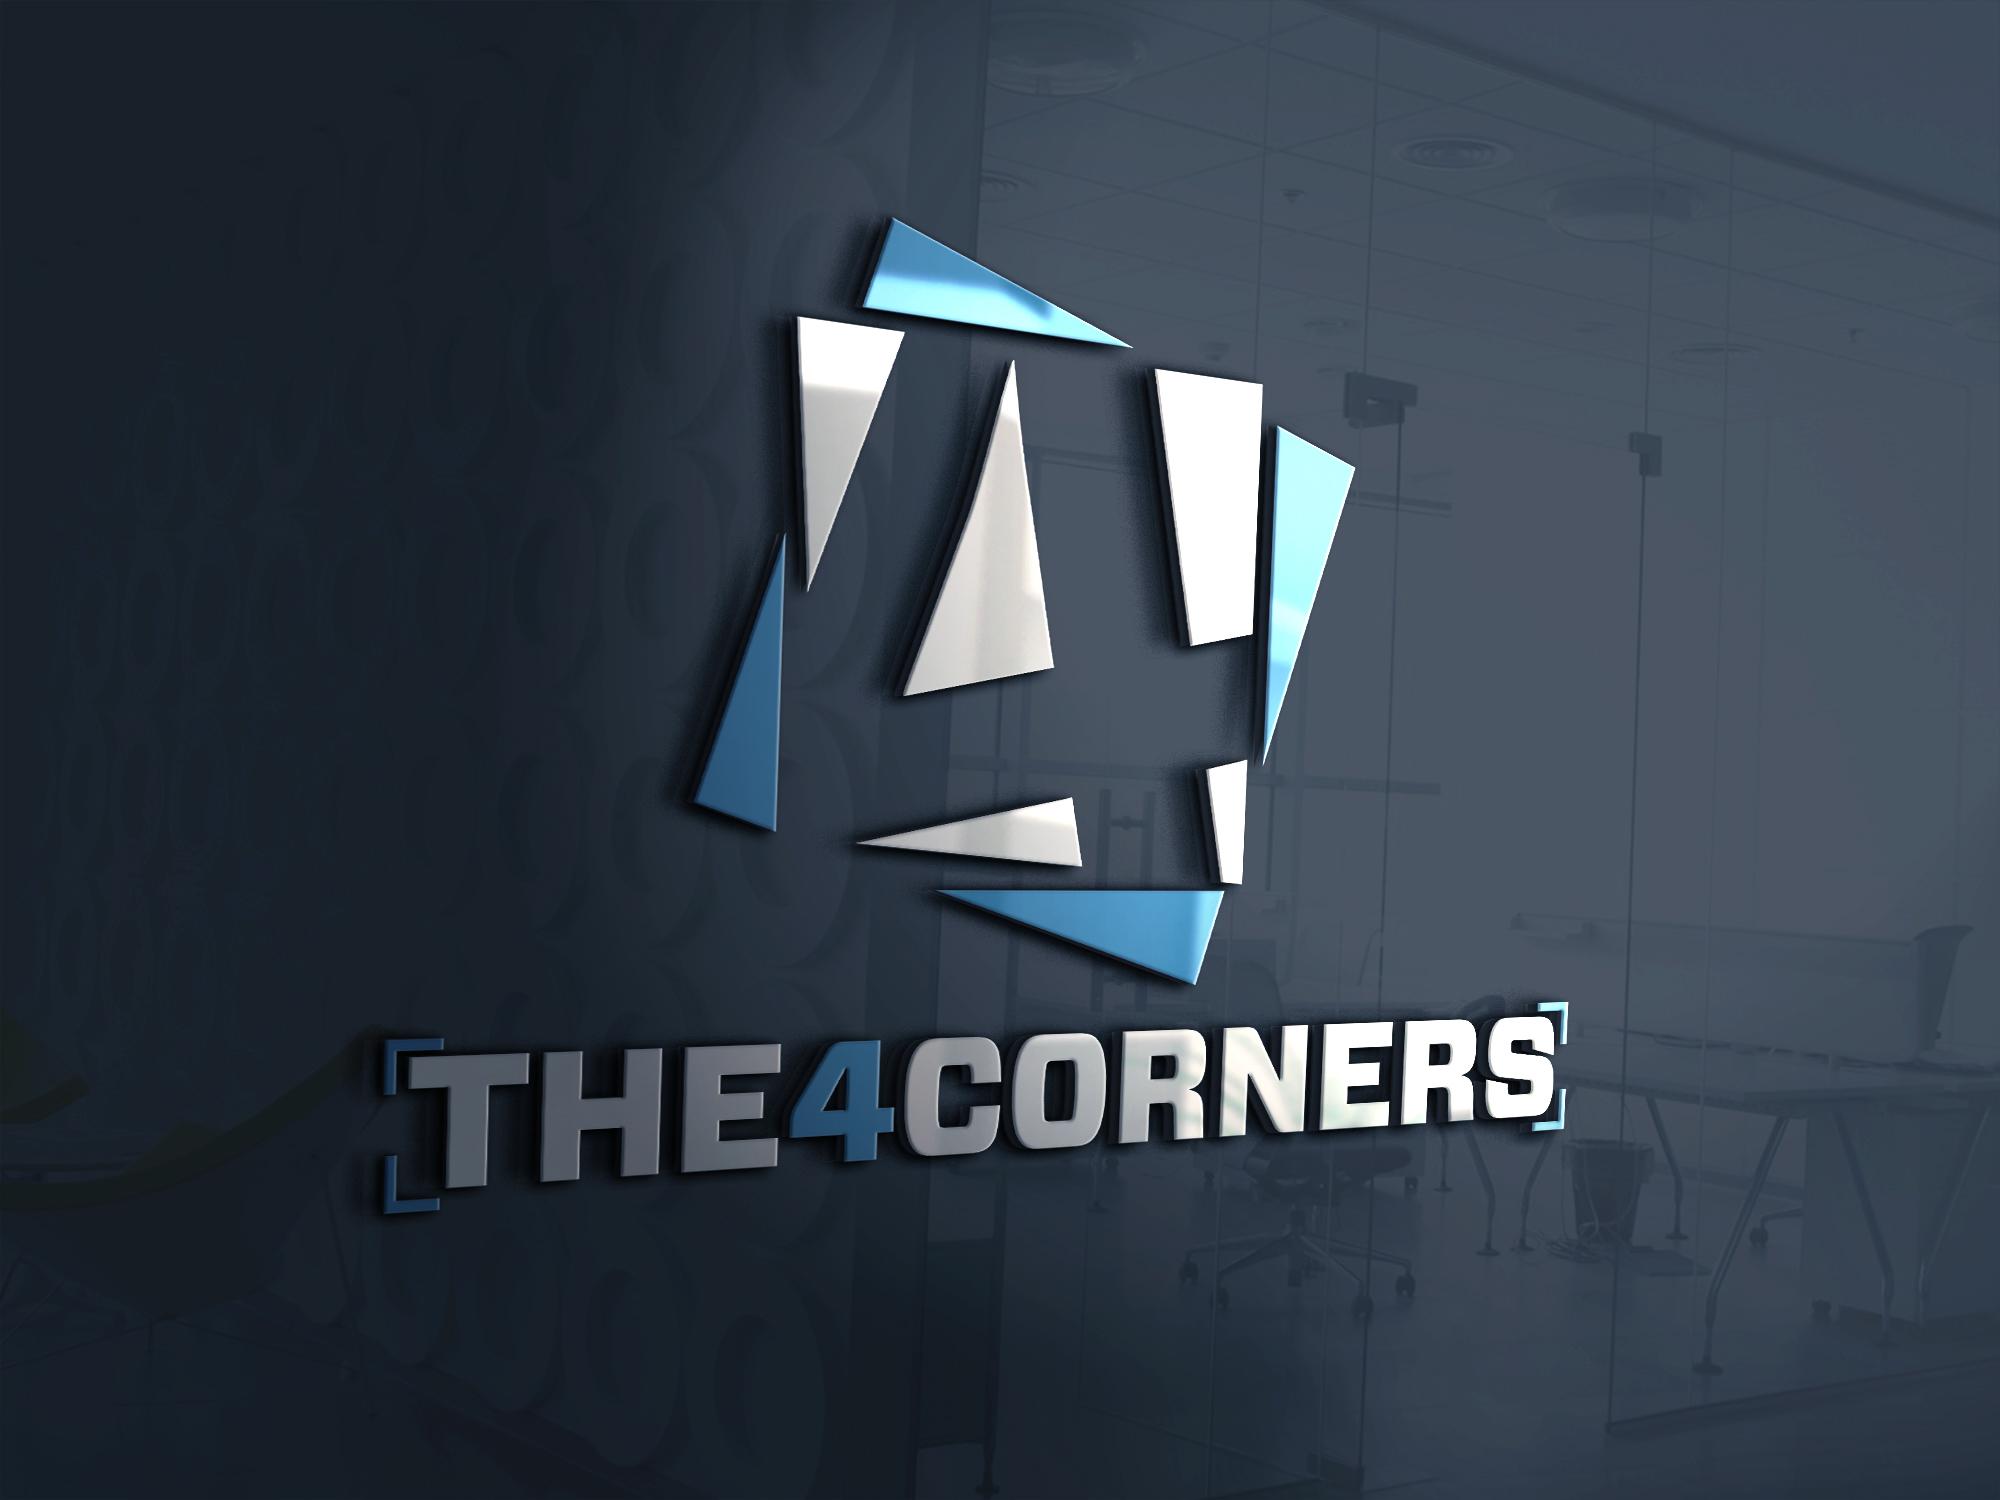 The4corners ecommerce website logo design by Badri Design